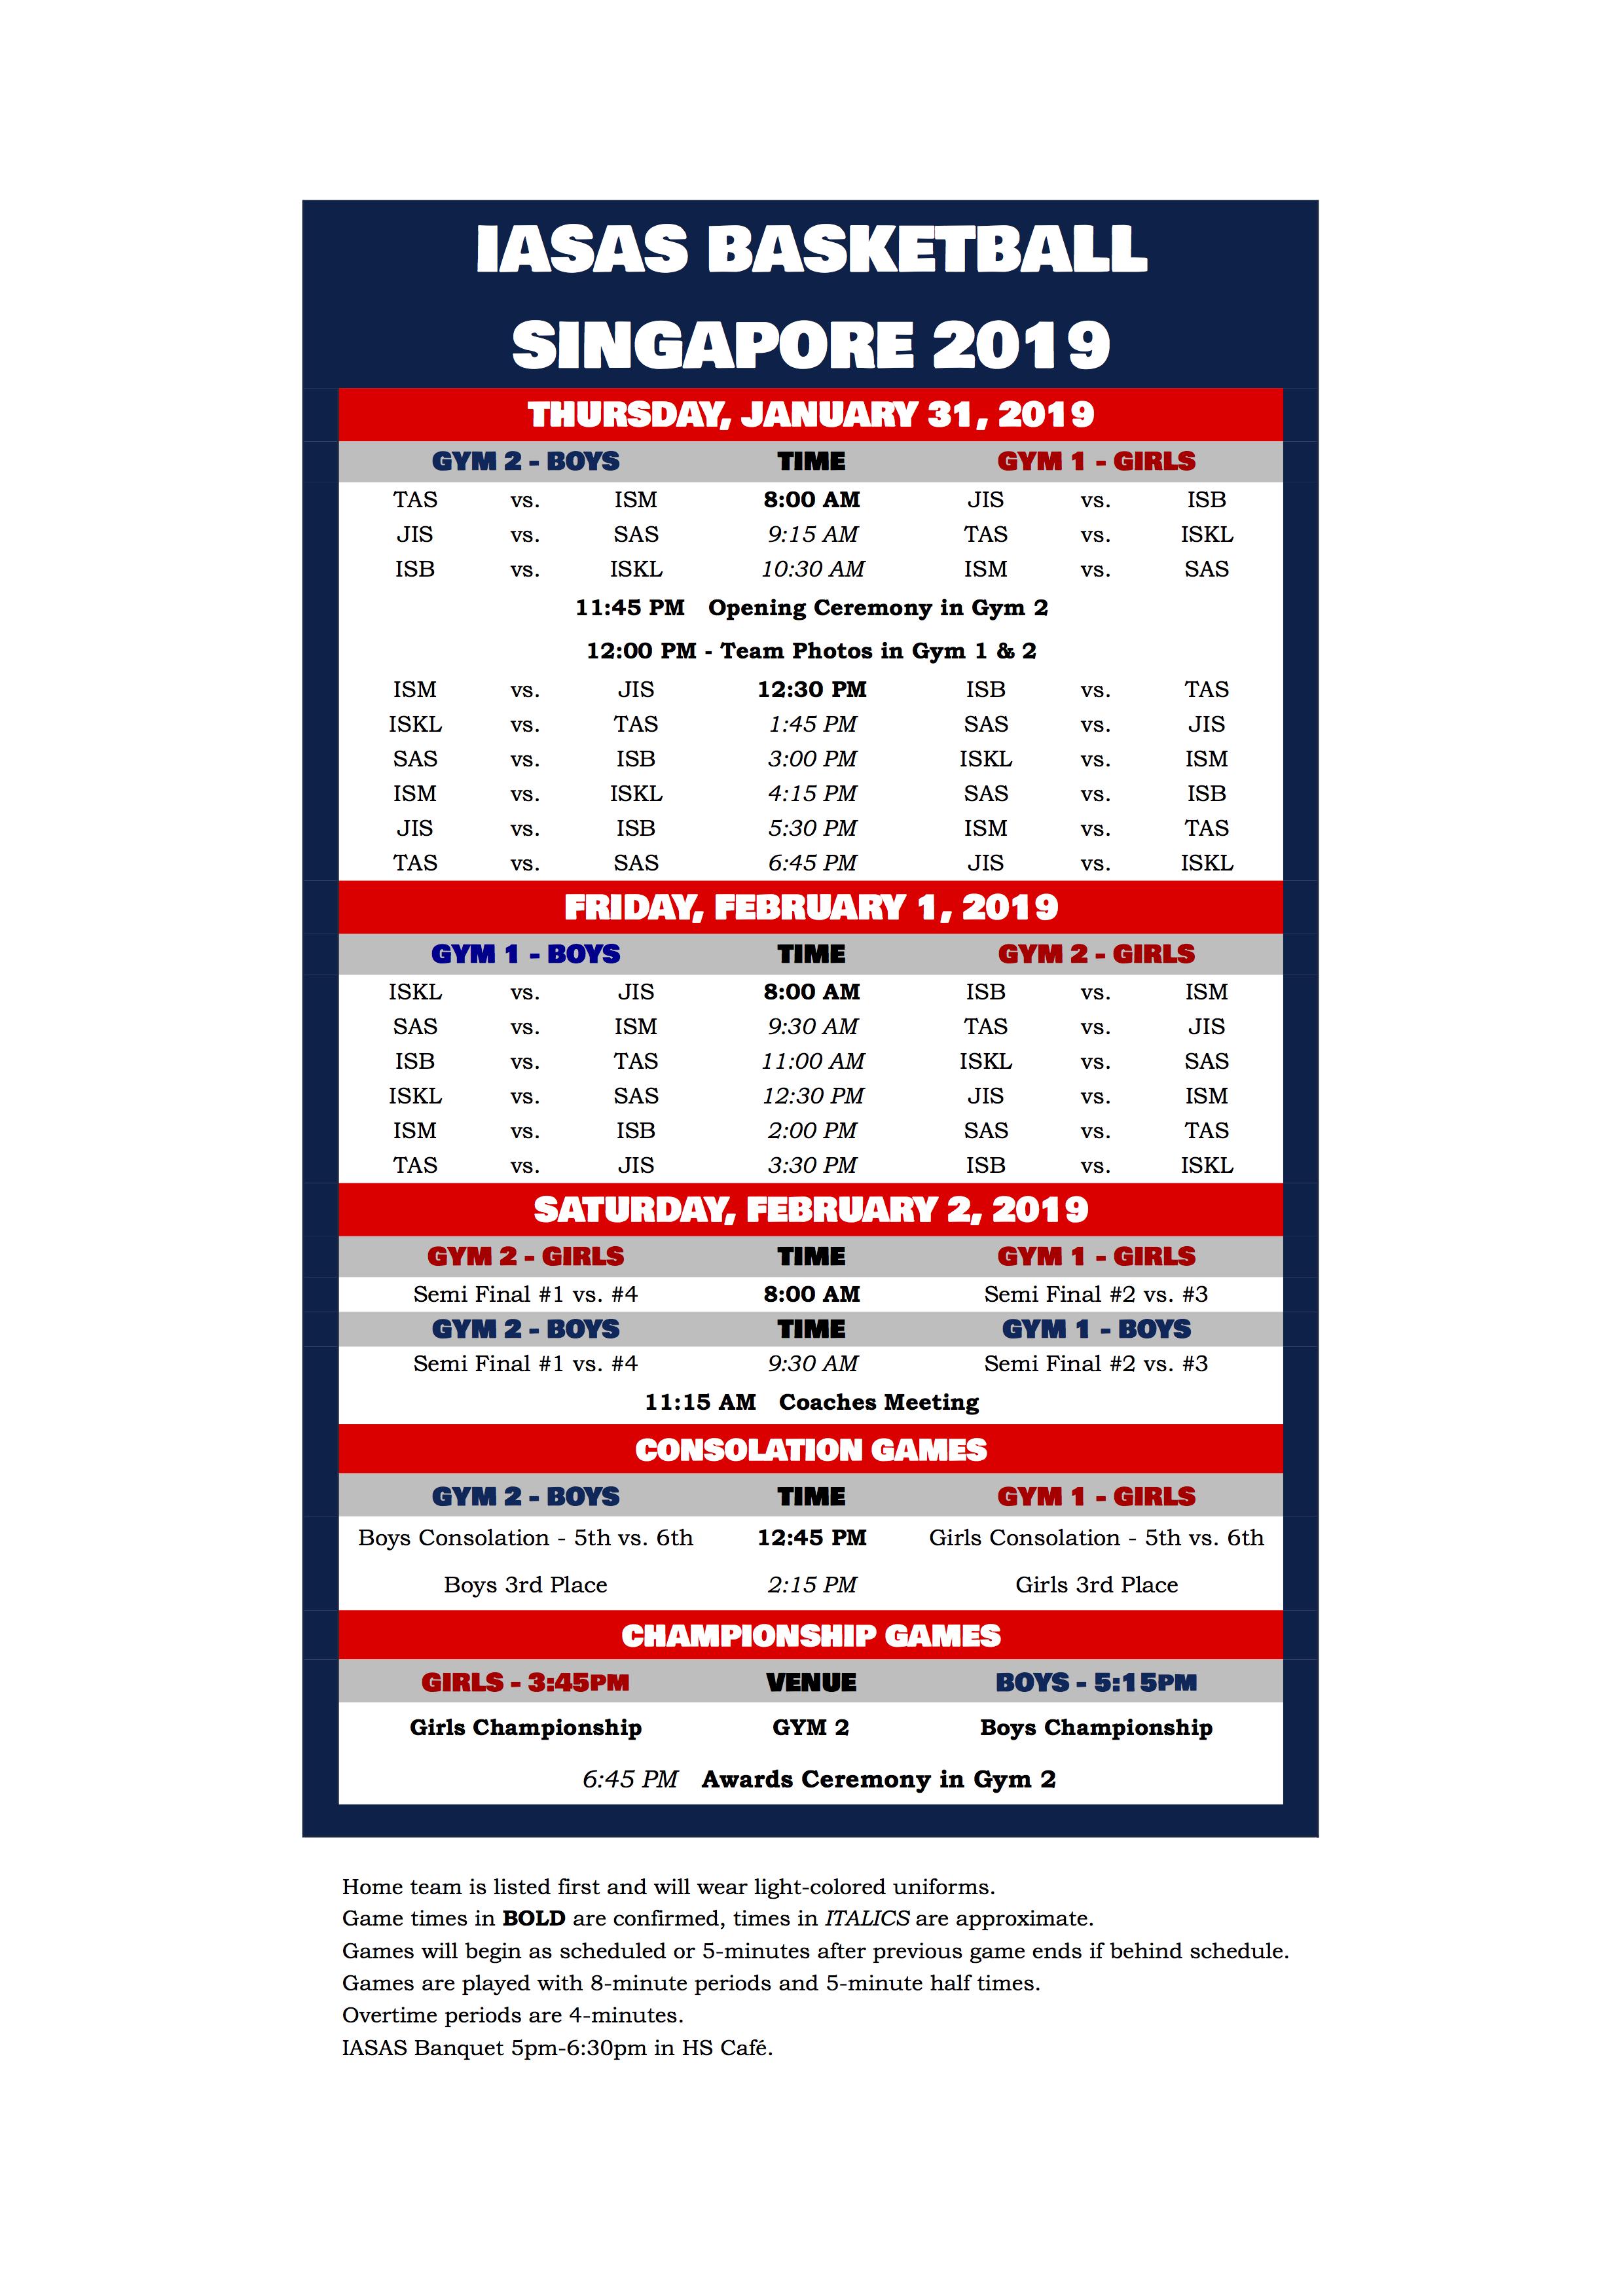 IASAS-Basketball-Schedule-2019.png